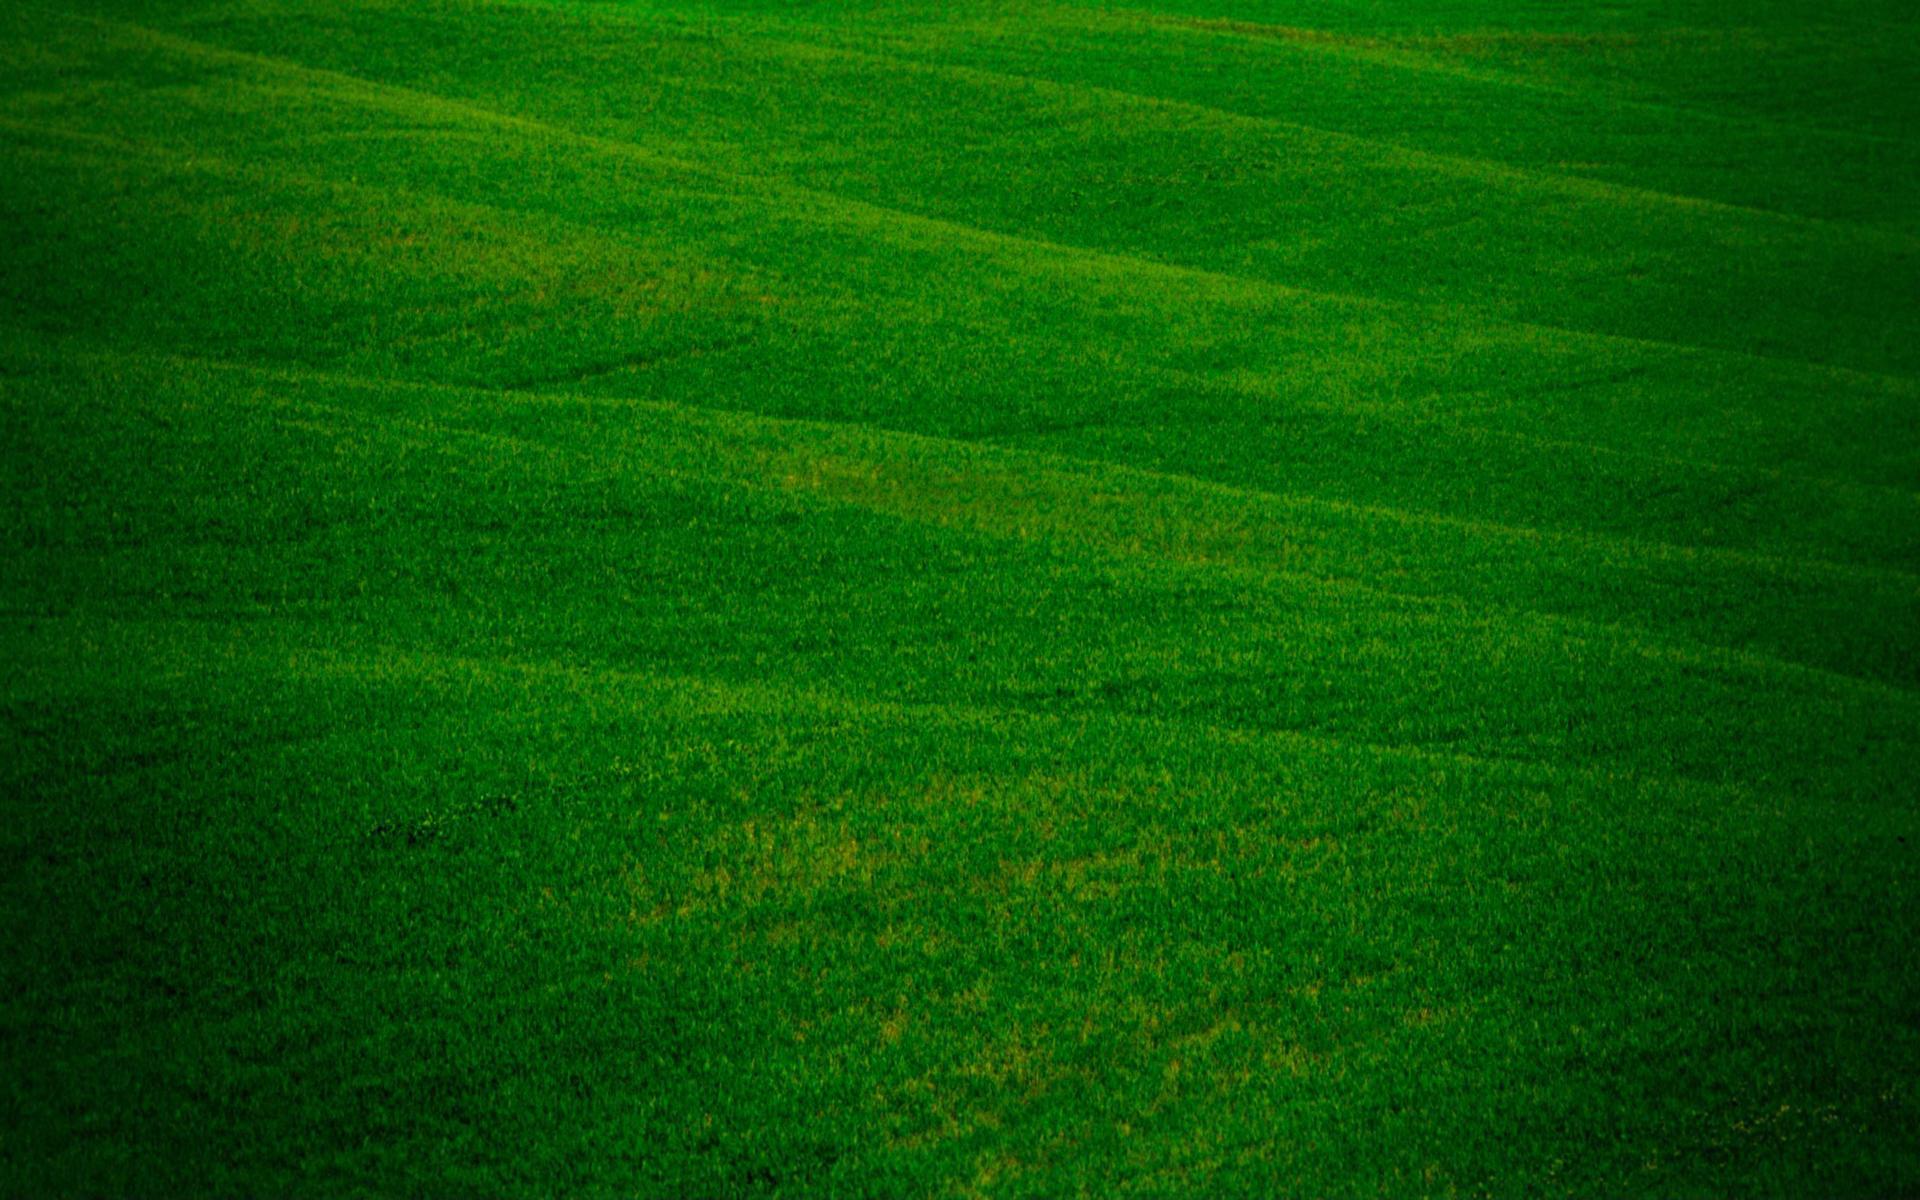 трава, рисунки, зелень